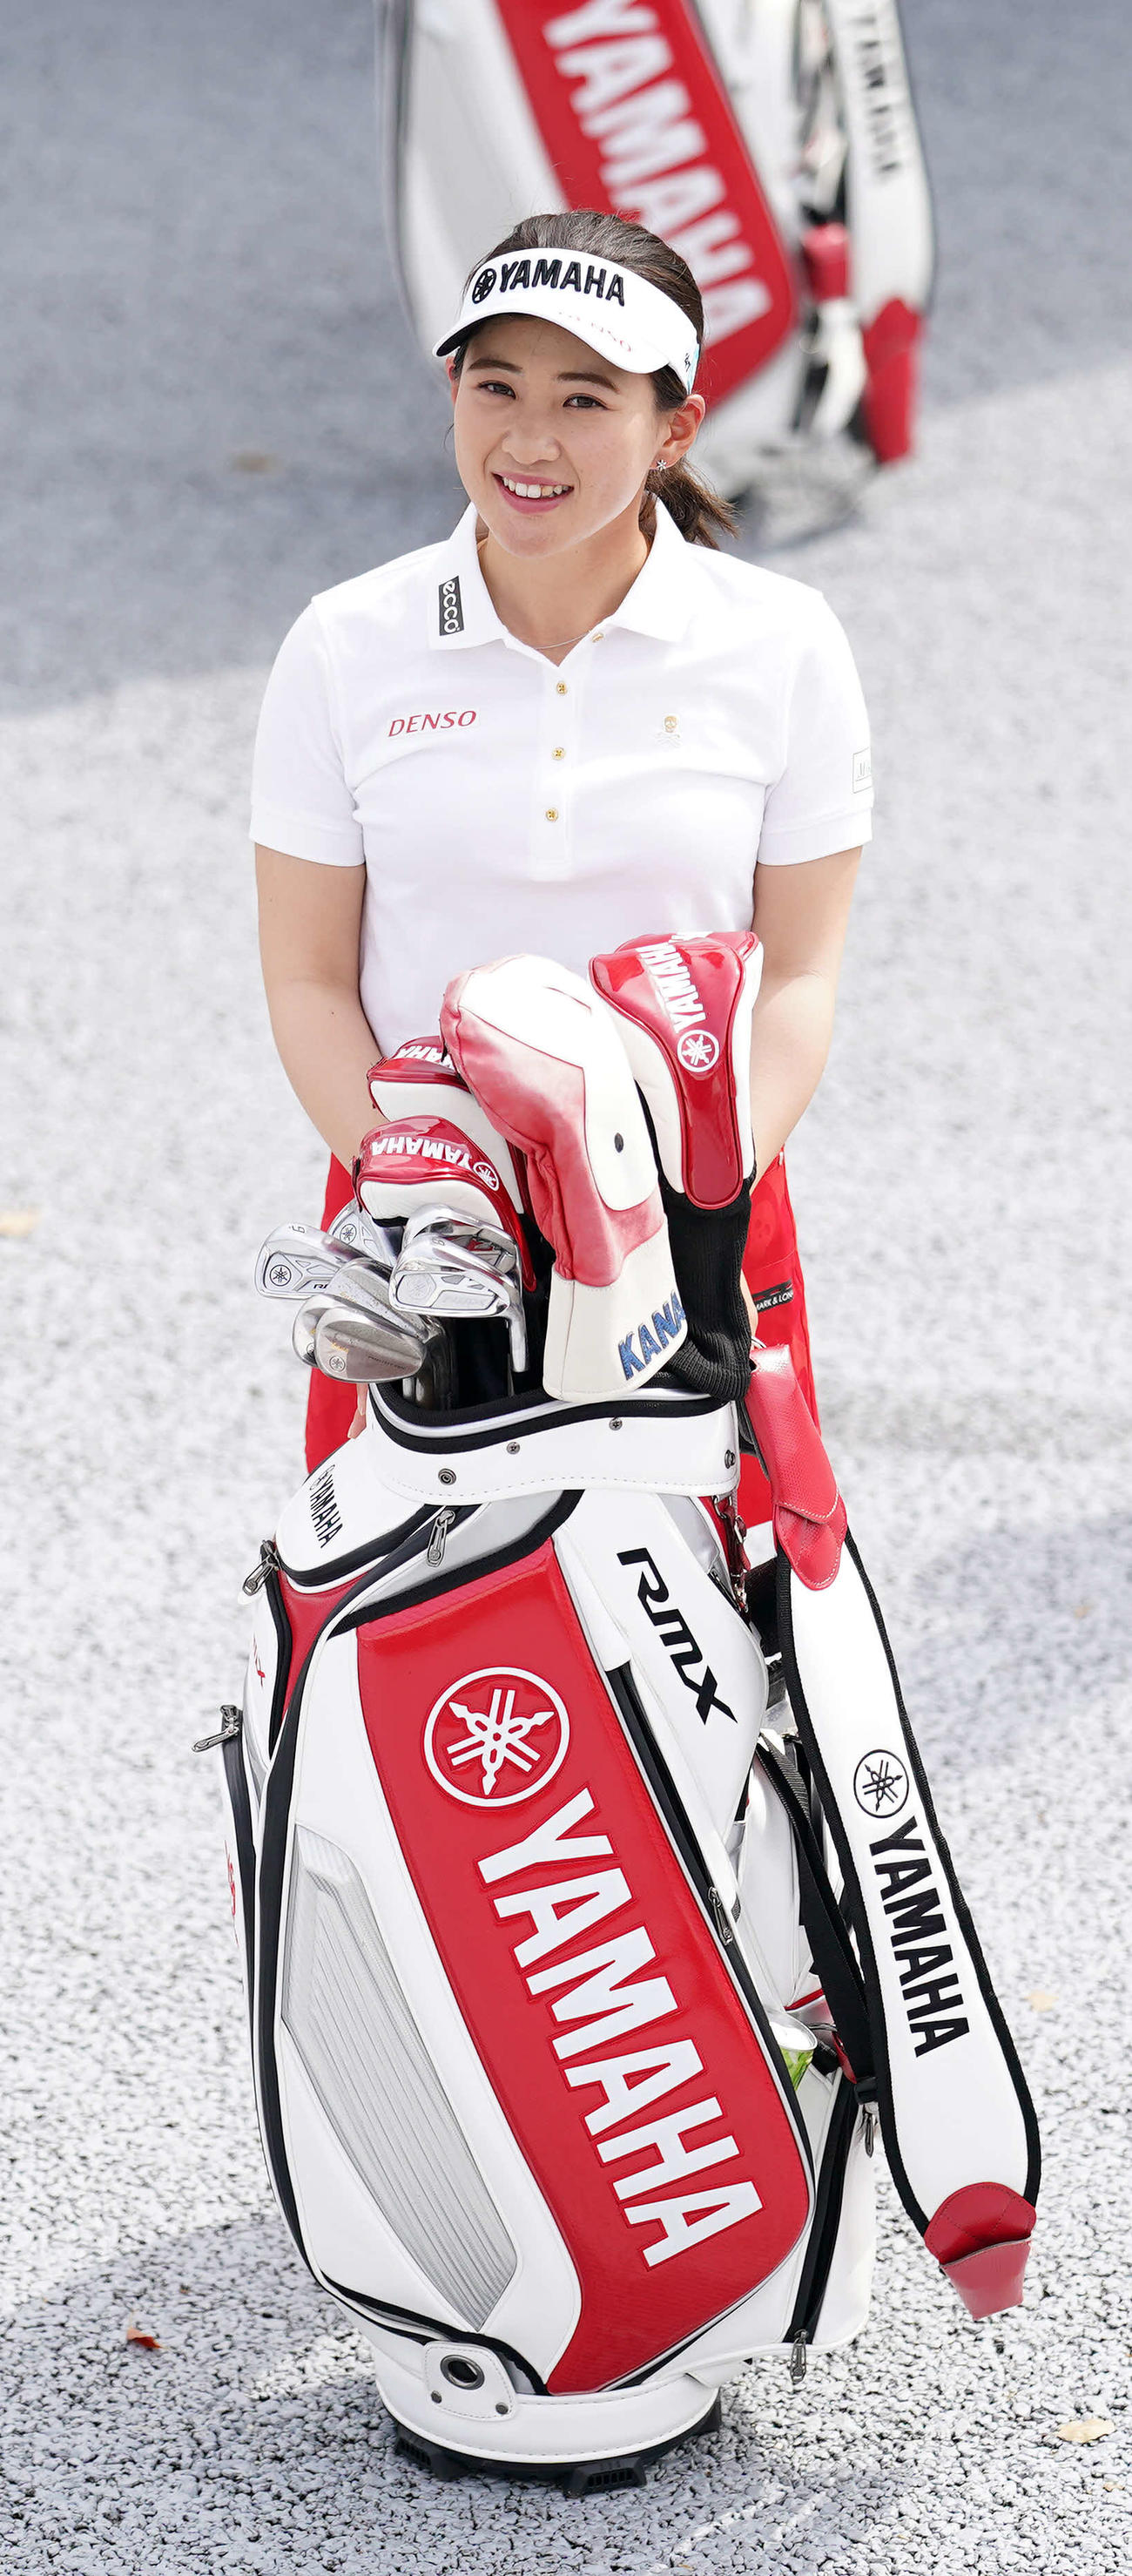 https://www.nikkansports.com/sports/golf/news/img/202103300000996-w1300_1.jpg